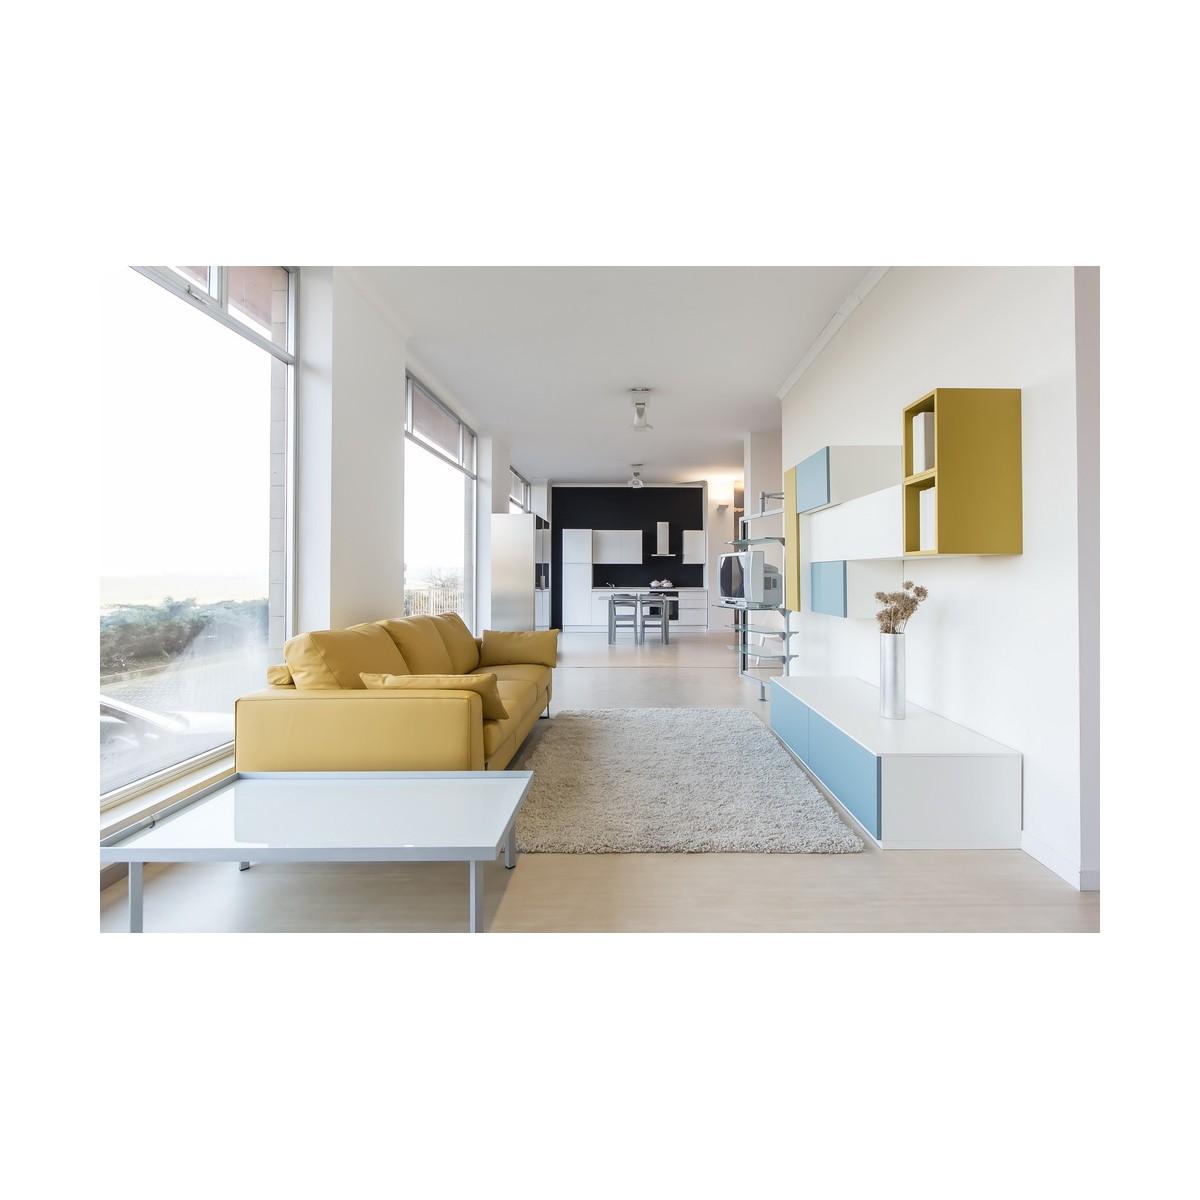 arredamento completo appartamento verytalian ForArredamento Appartamento Completo